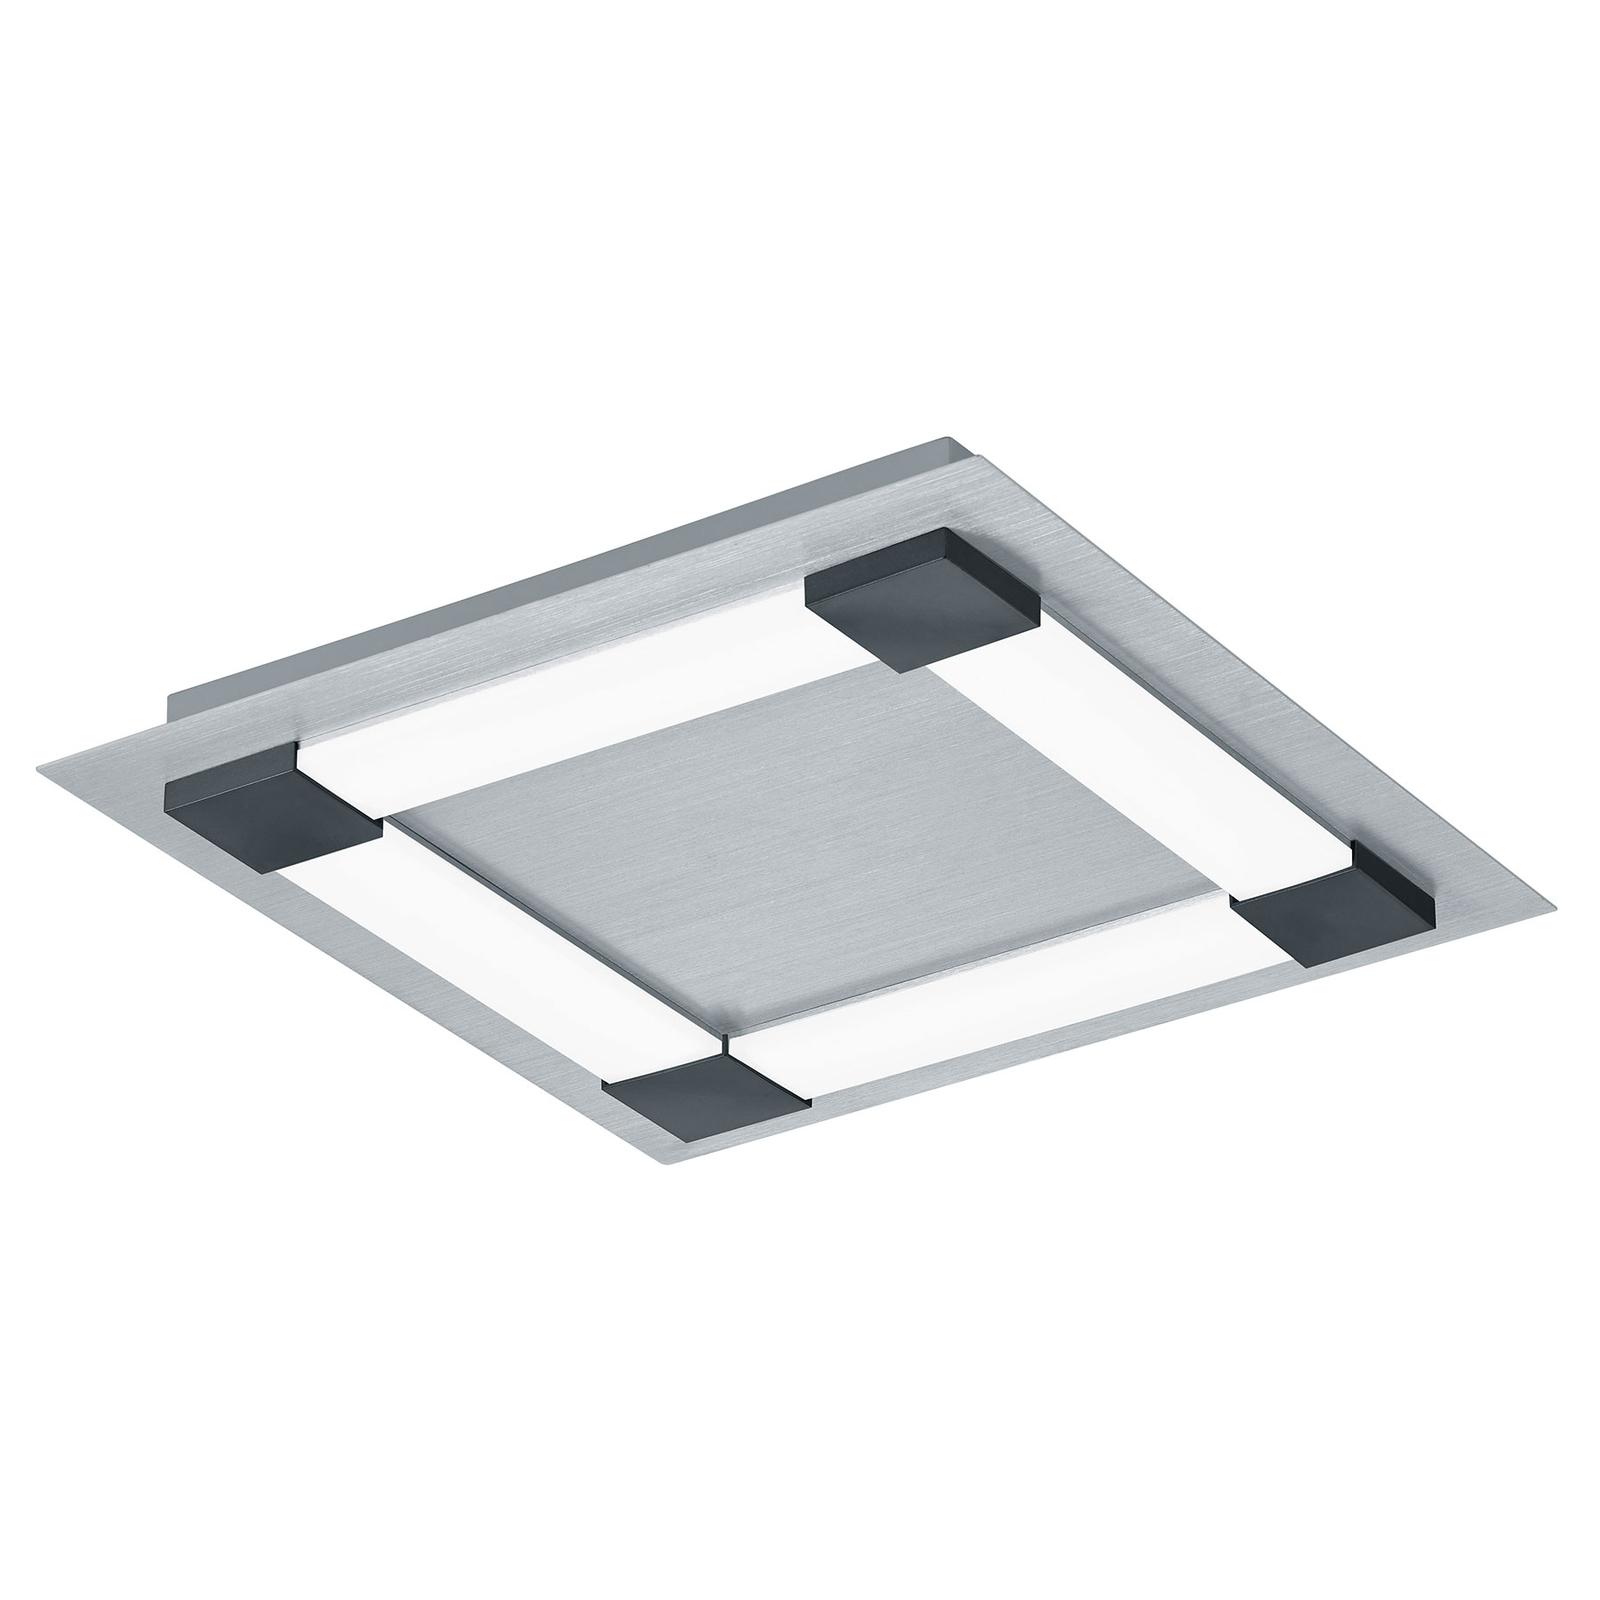 Bopp Plain LED-Deckenlampe 48x48cm smart steuerbar